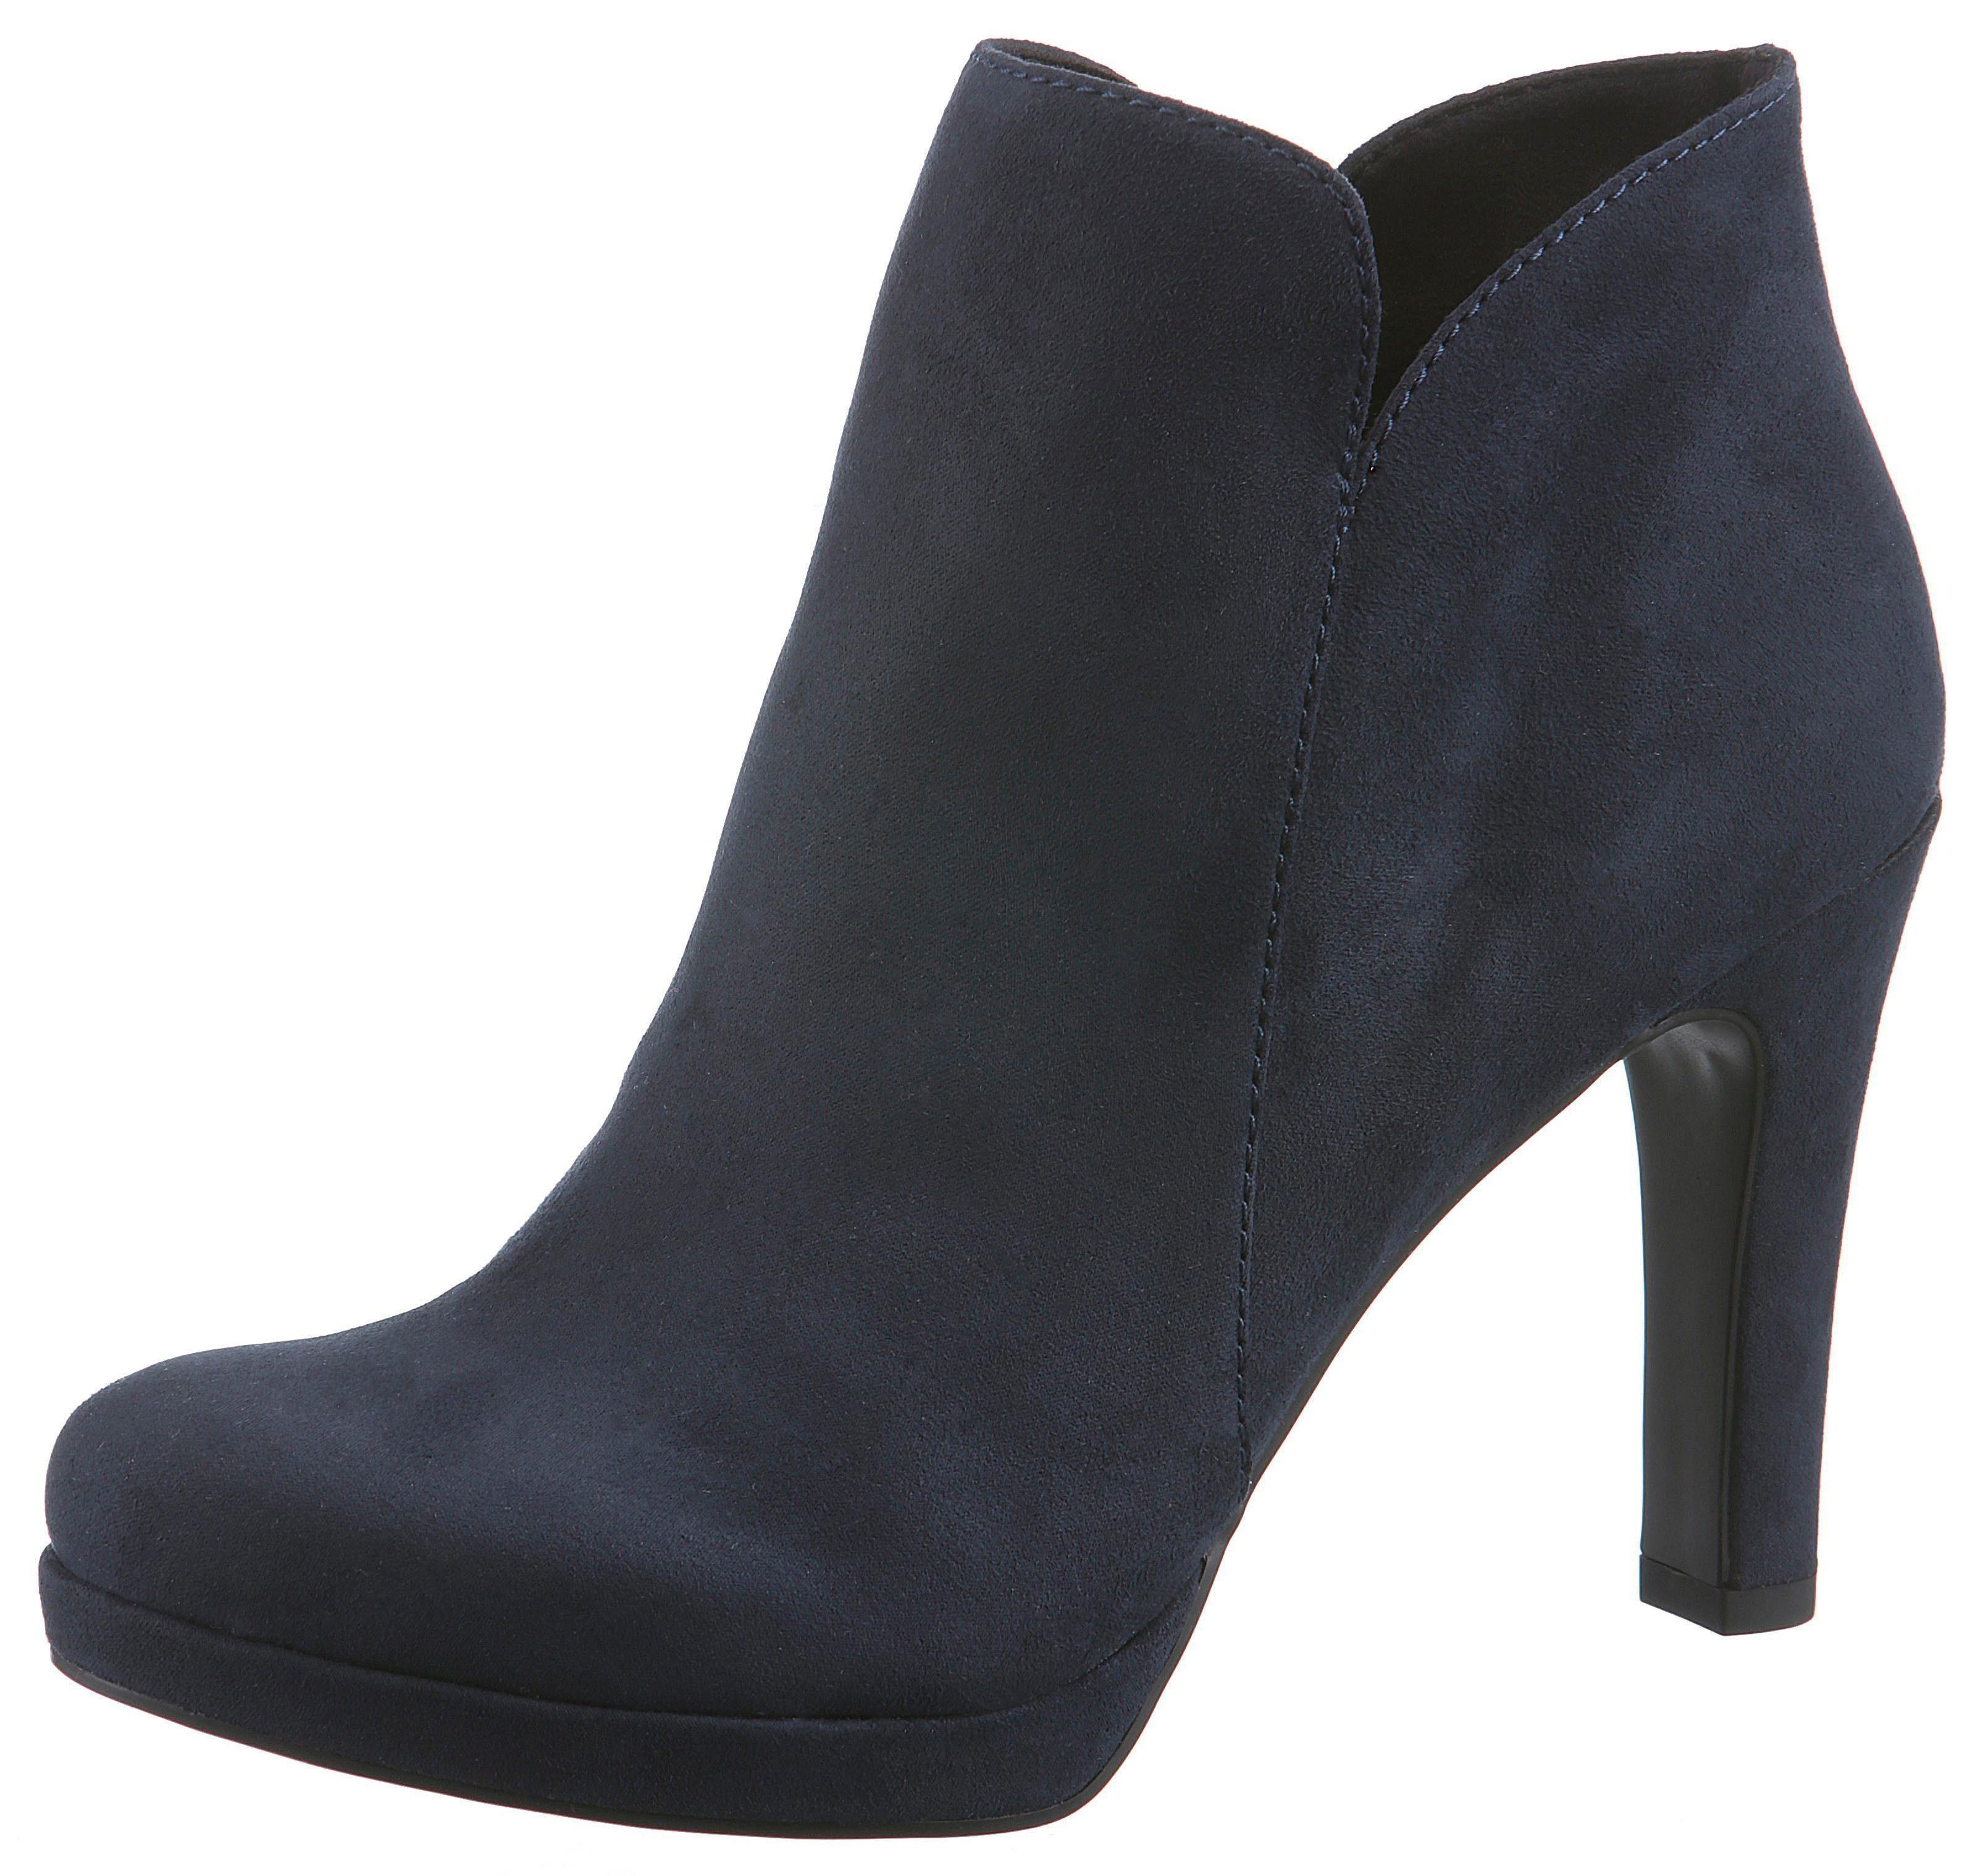 Tamaris High-Heel-Stiefelette | Schuhe > High Heels | tamaris